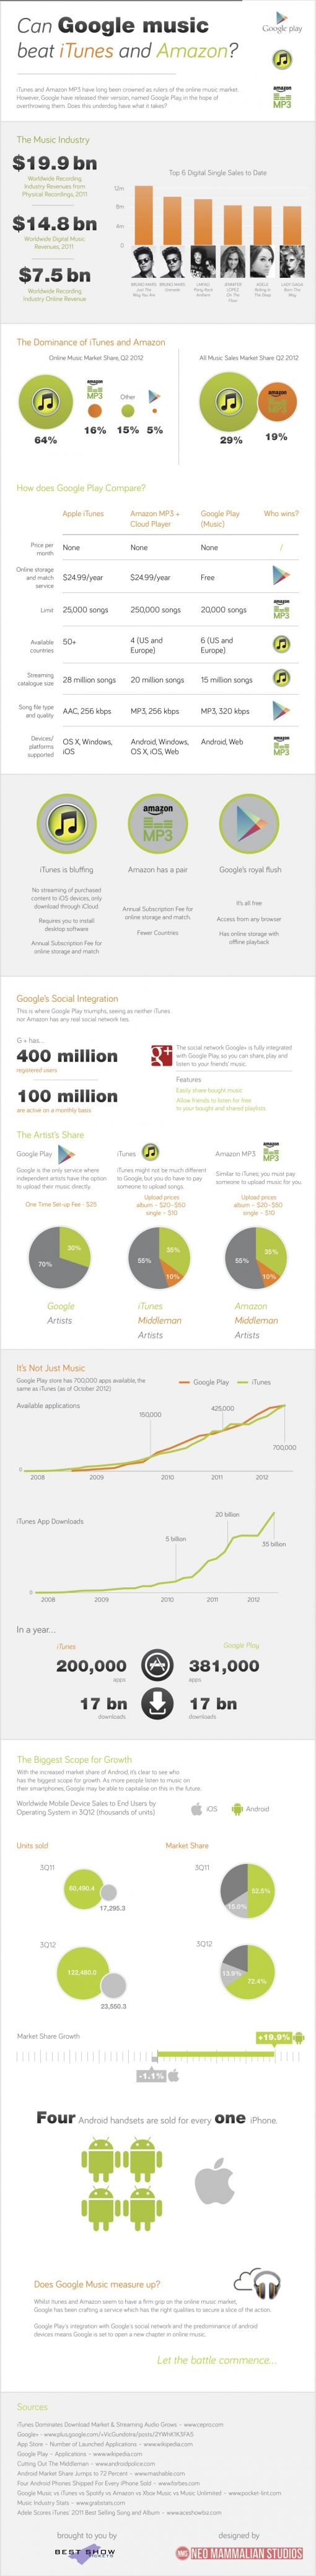 can-google-music-beat-itunes1